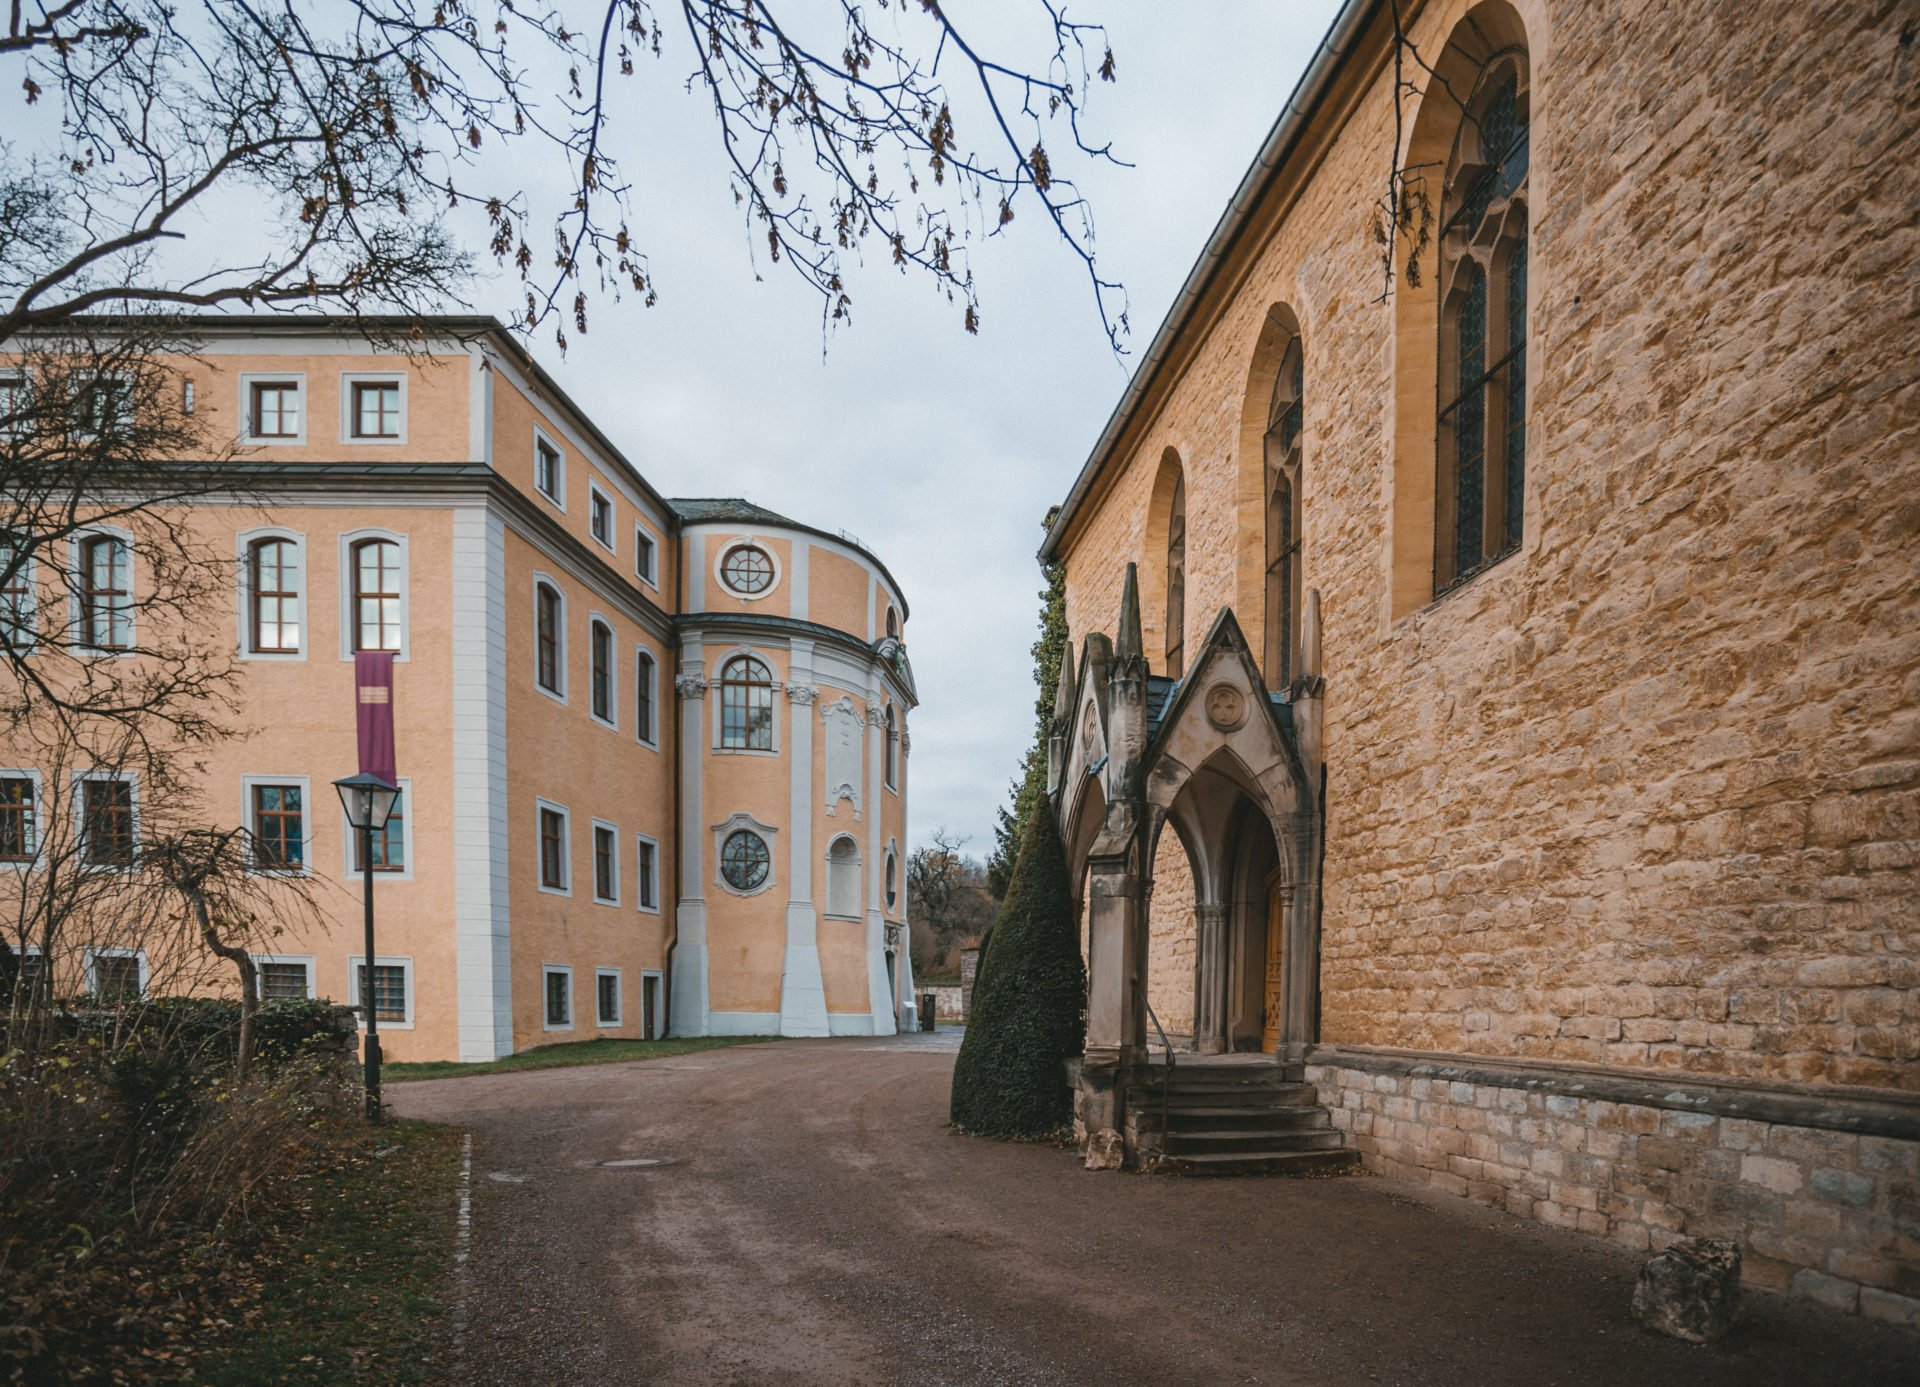 50mmfreunde Erfurt Jena Weimar Ettersburg Hochzeit 02 1920x1387 - Dezemberhochzeit im Schloss Ettersburg bei Weimar